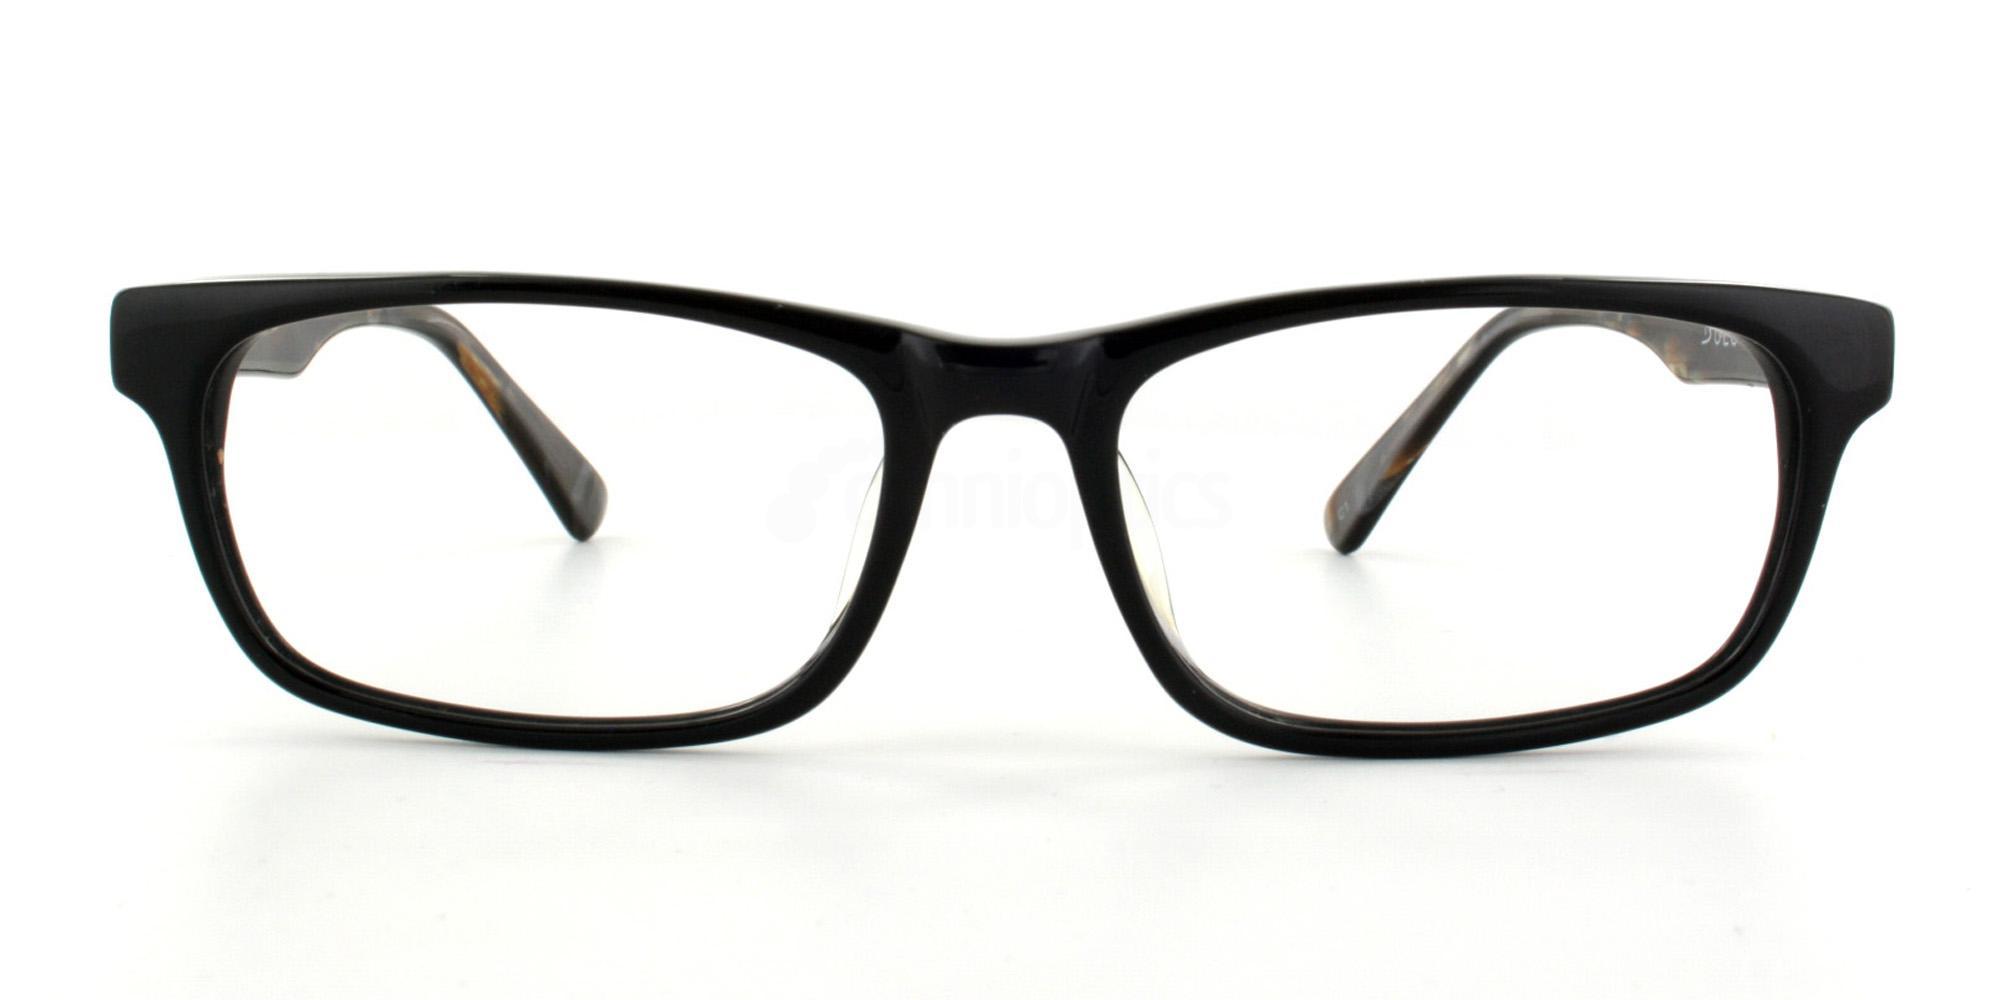 C1 HY81100 Glasses, Hallmark